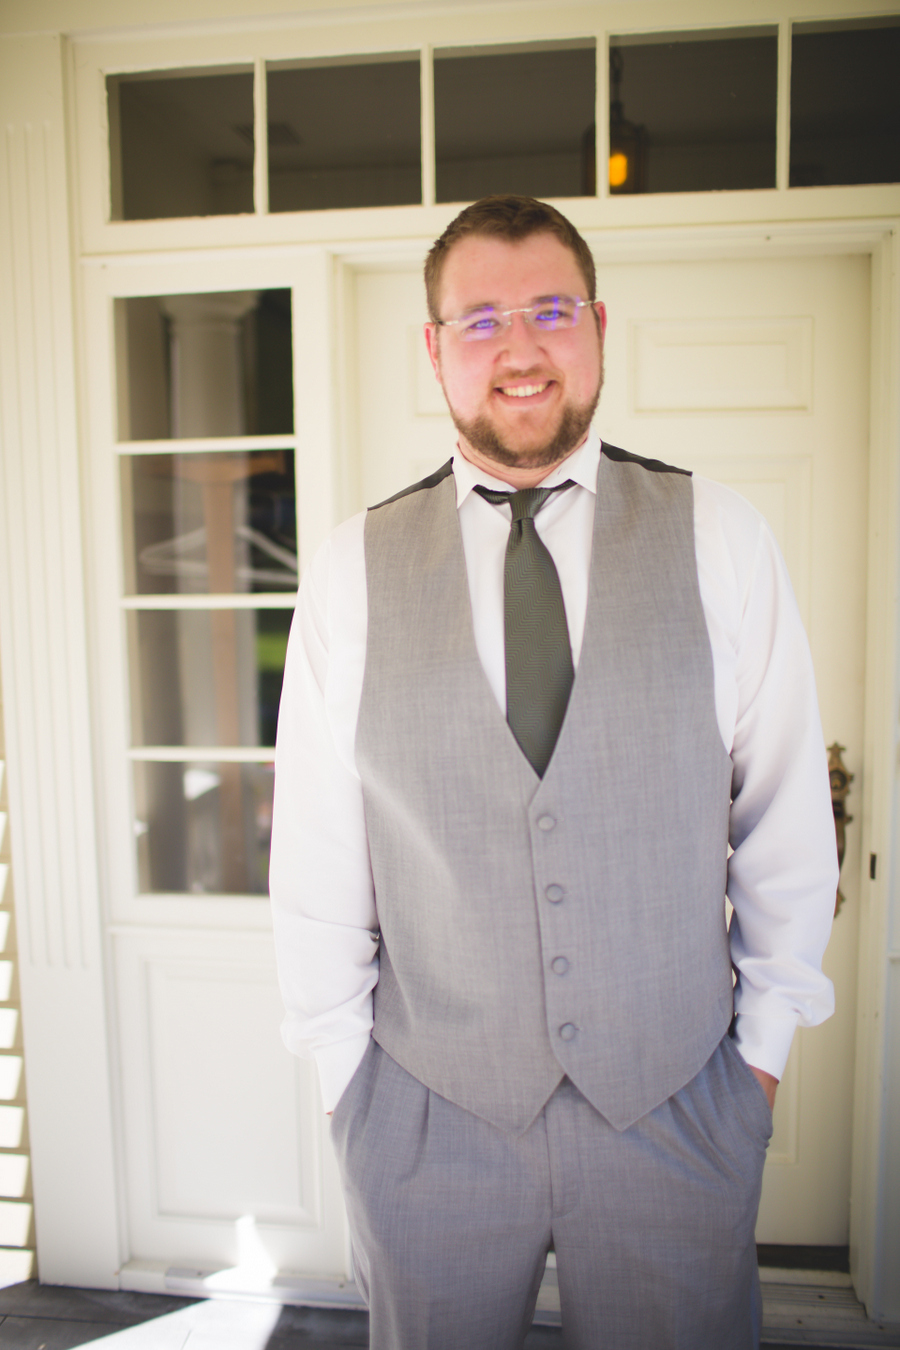 07-Young-Porter Wedding-134.jpg